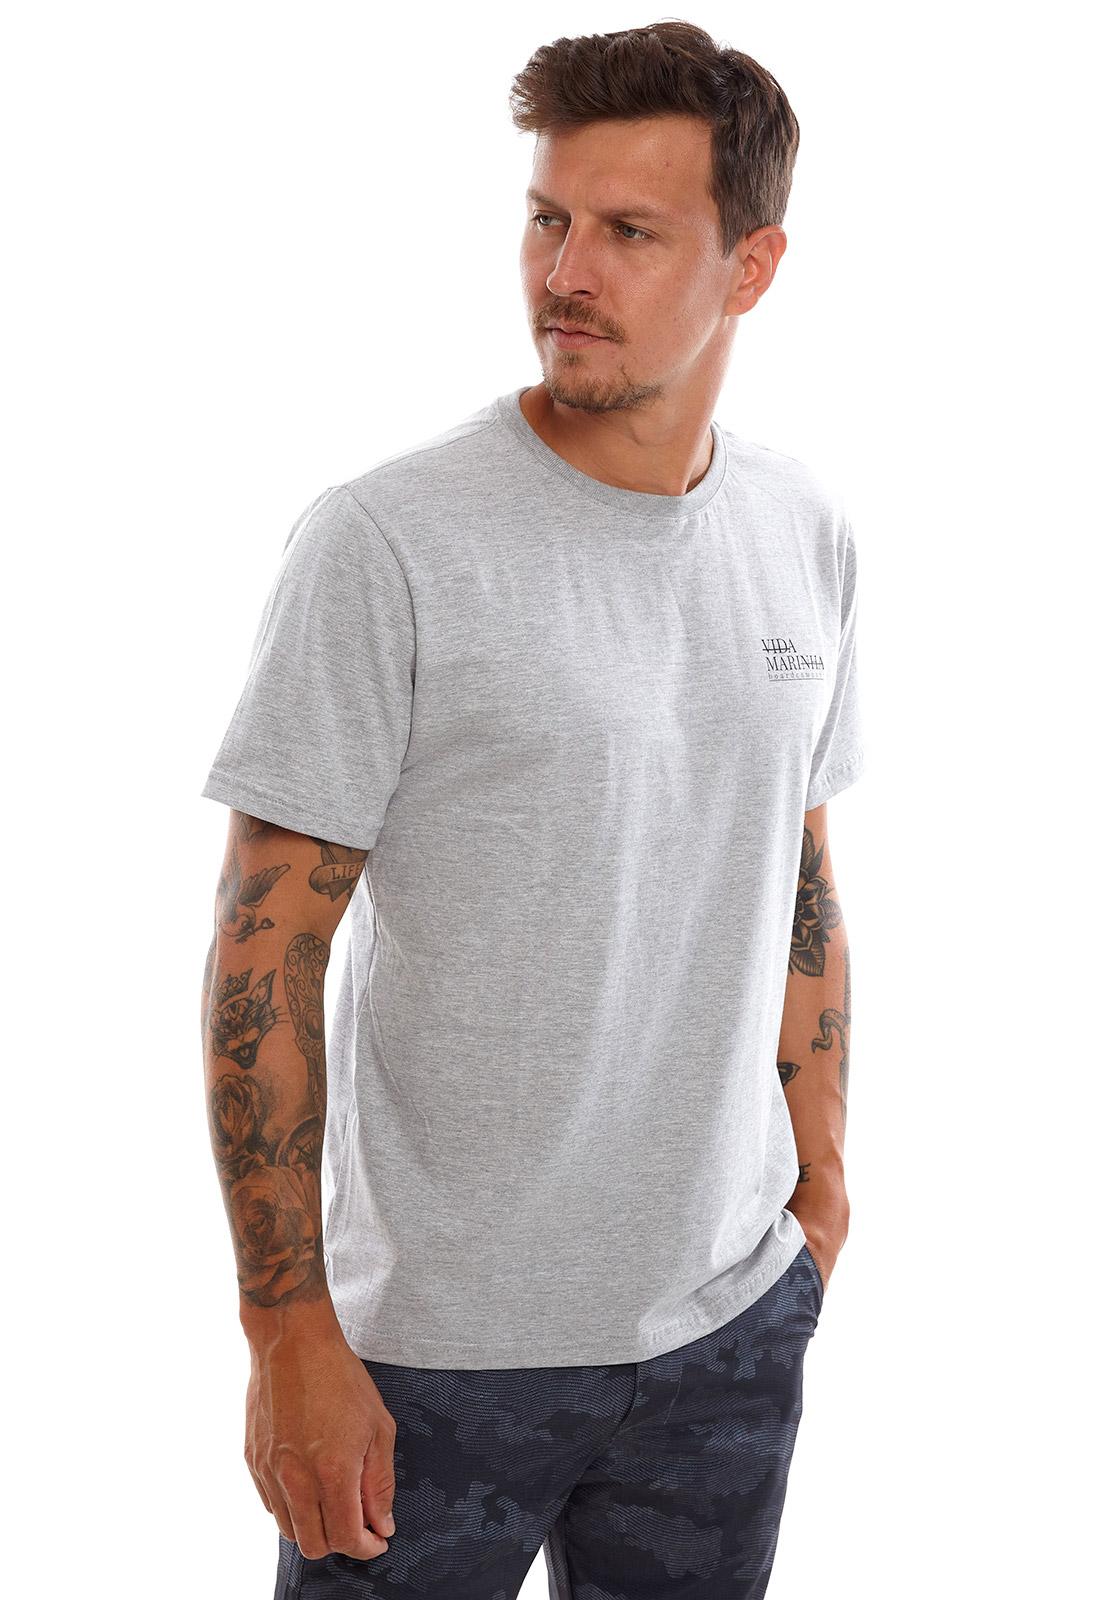 Camiseta Vida Marinha Manga Curta Cinza Claro